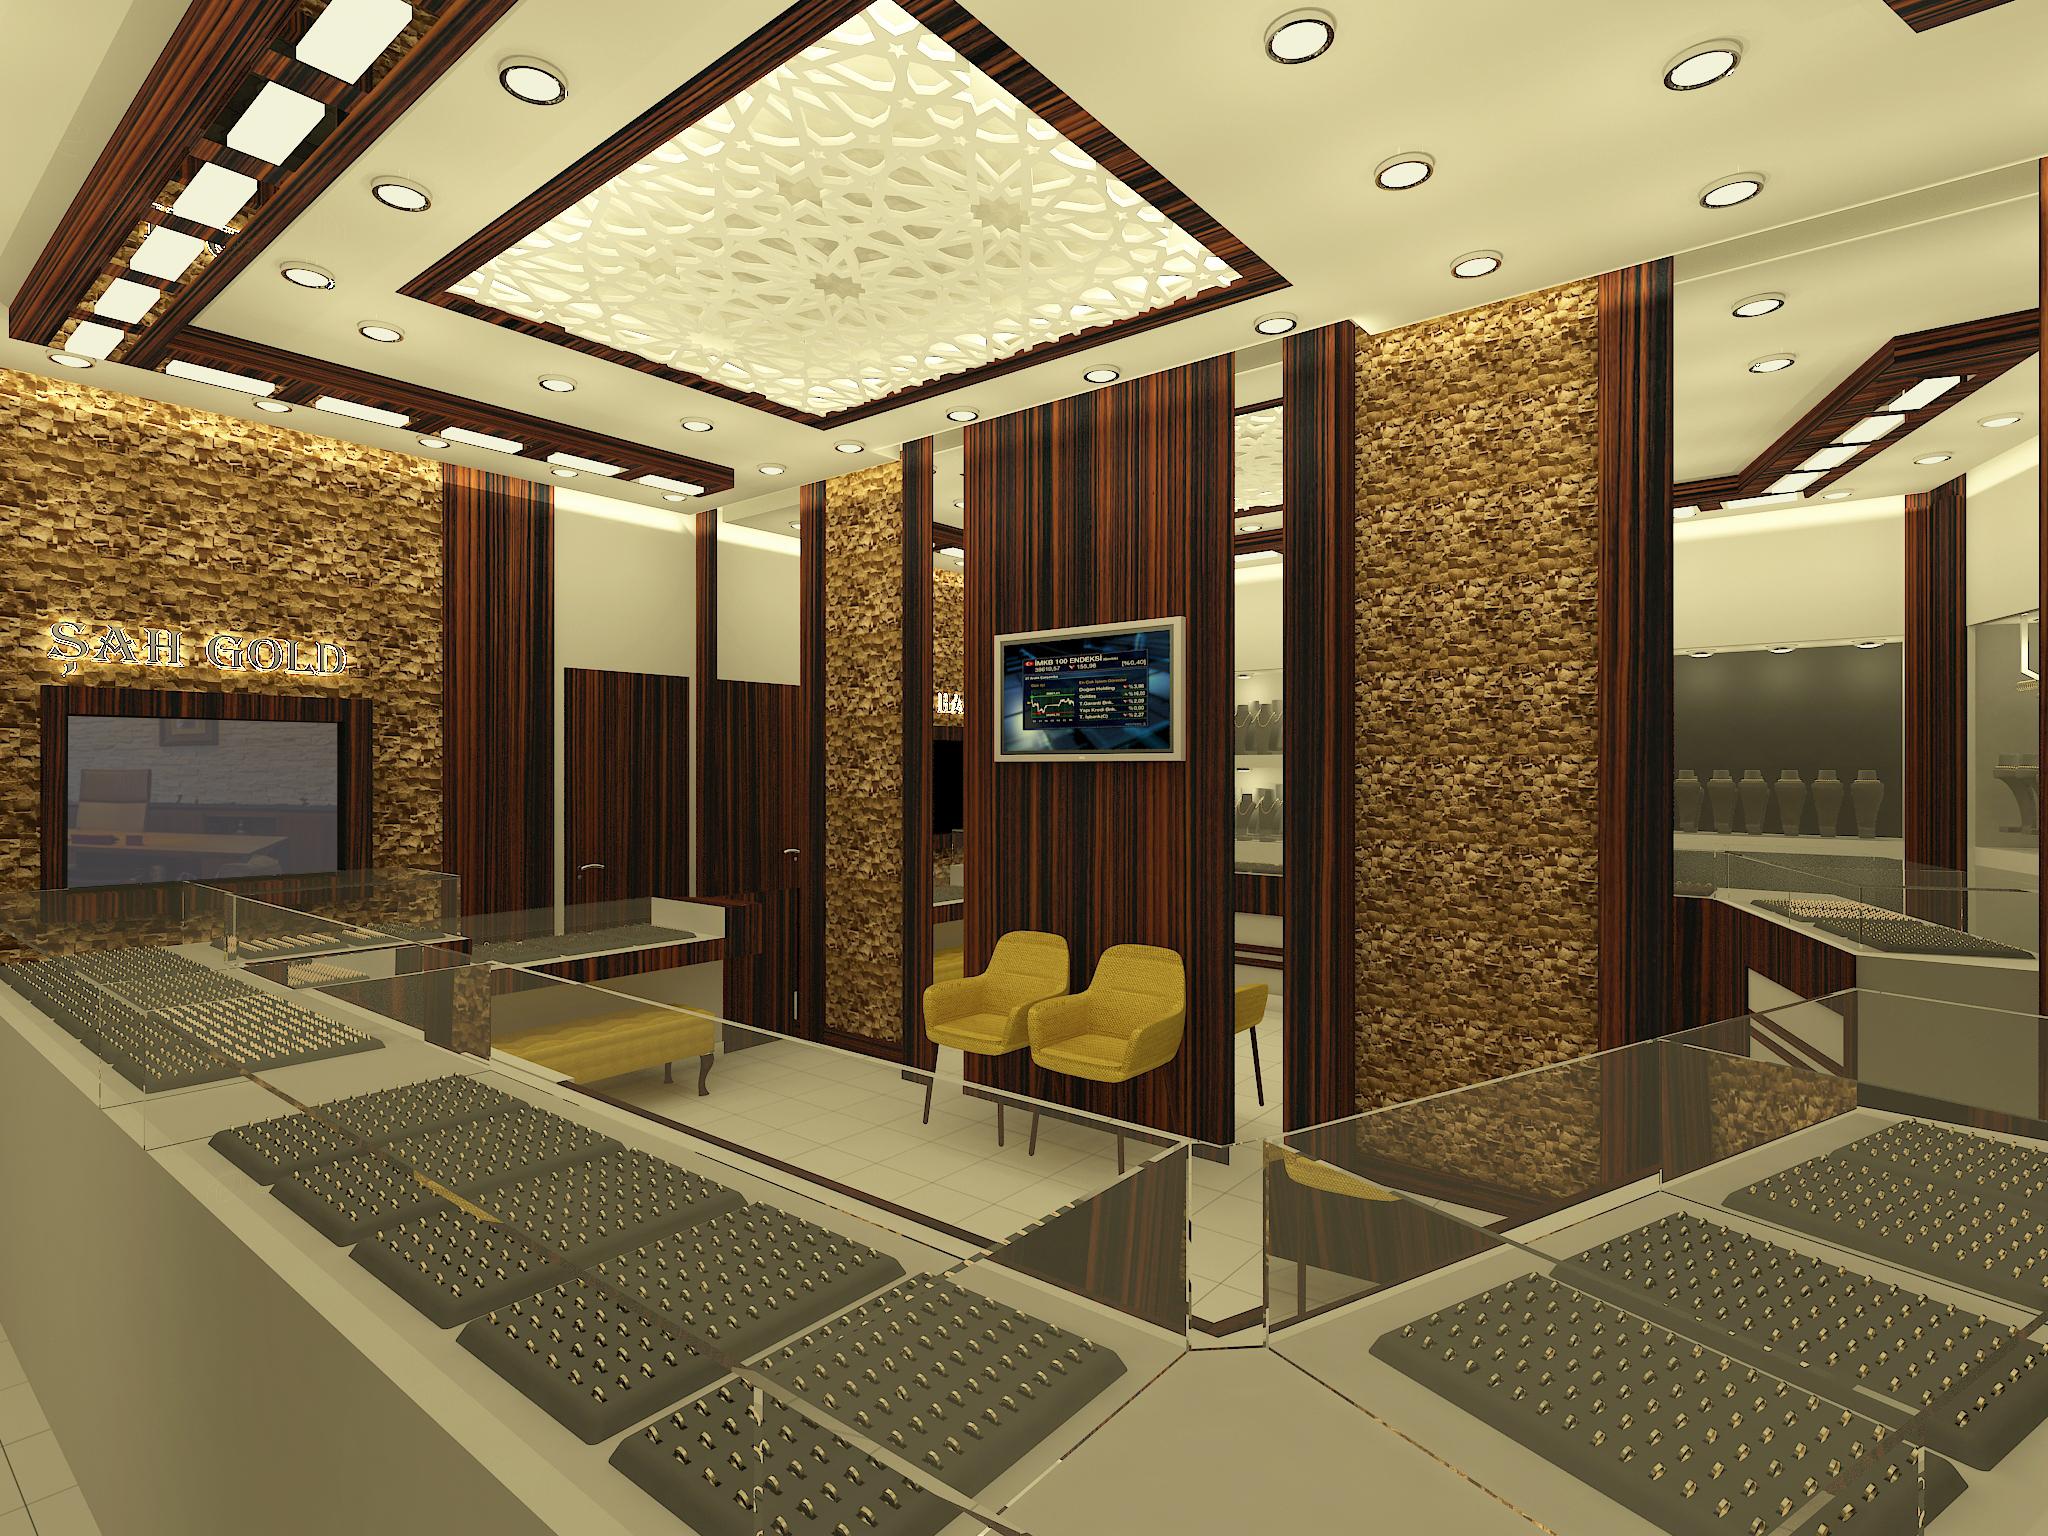 Şahgold Kuyumculuk,  Kuyumcu mağaza tasarımları (4)